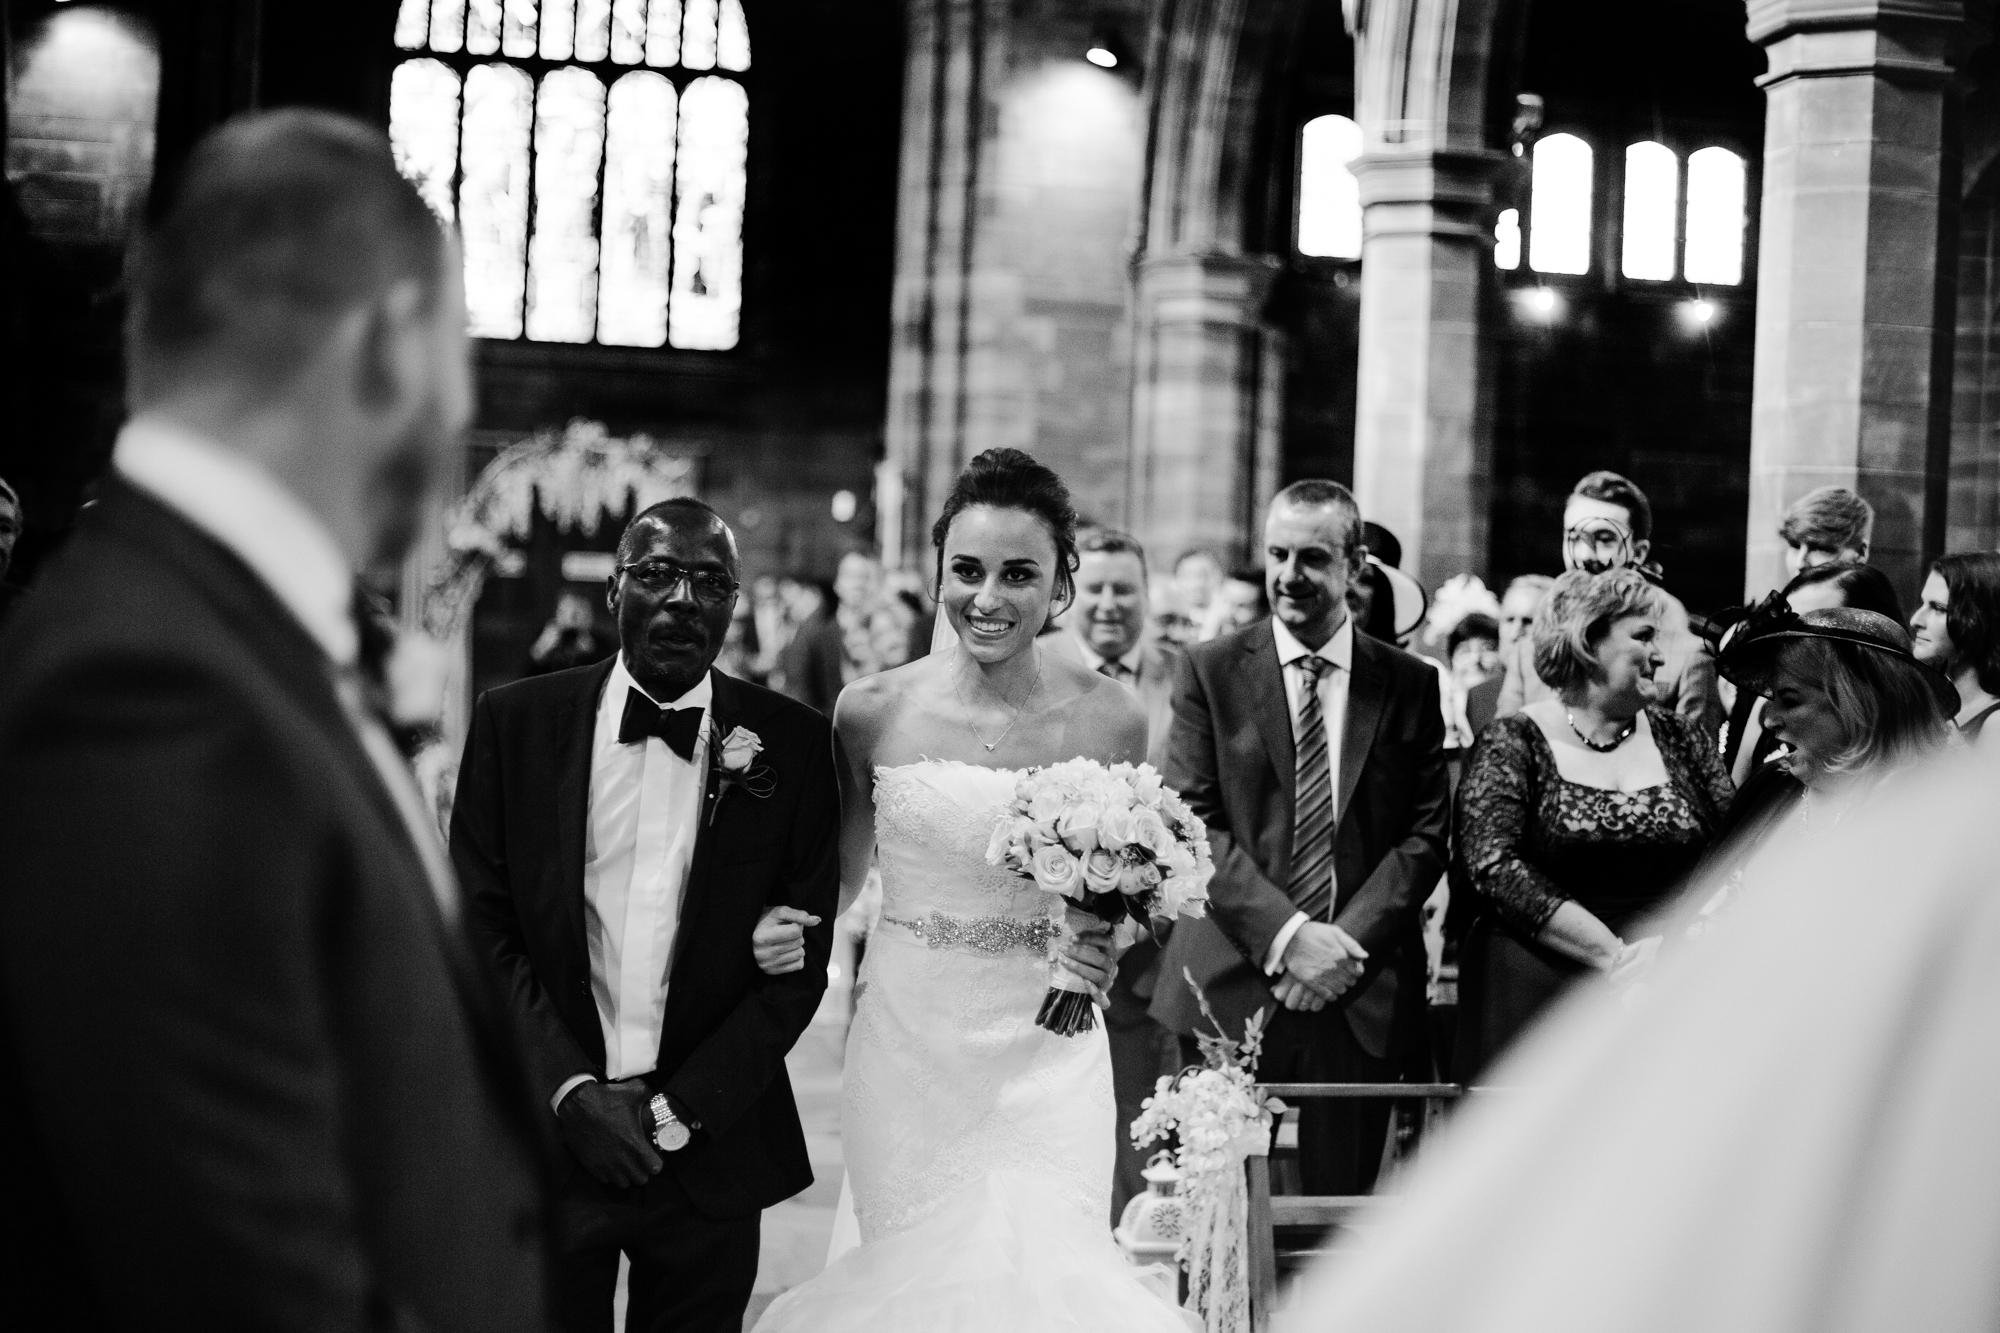 Laura & James - Sansom Wedding Photography Yorkshire-24